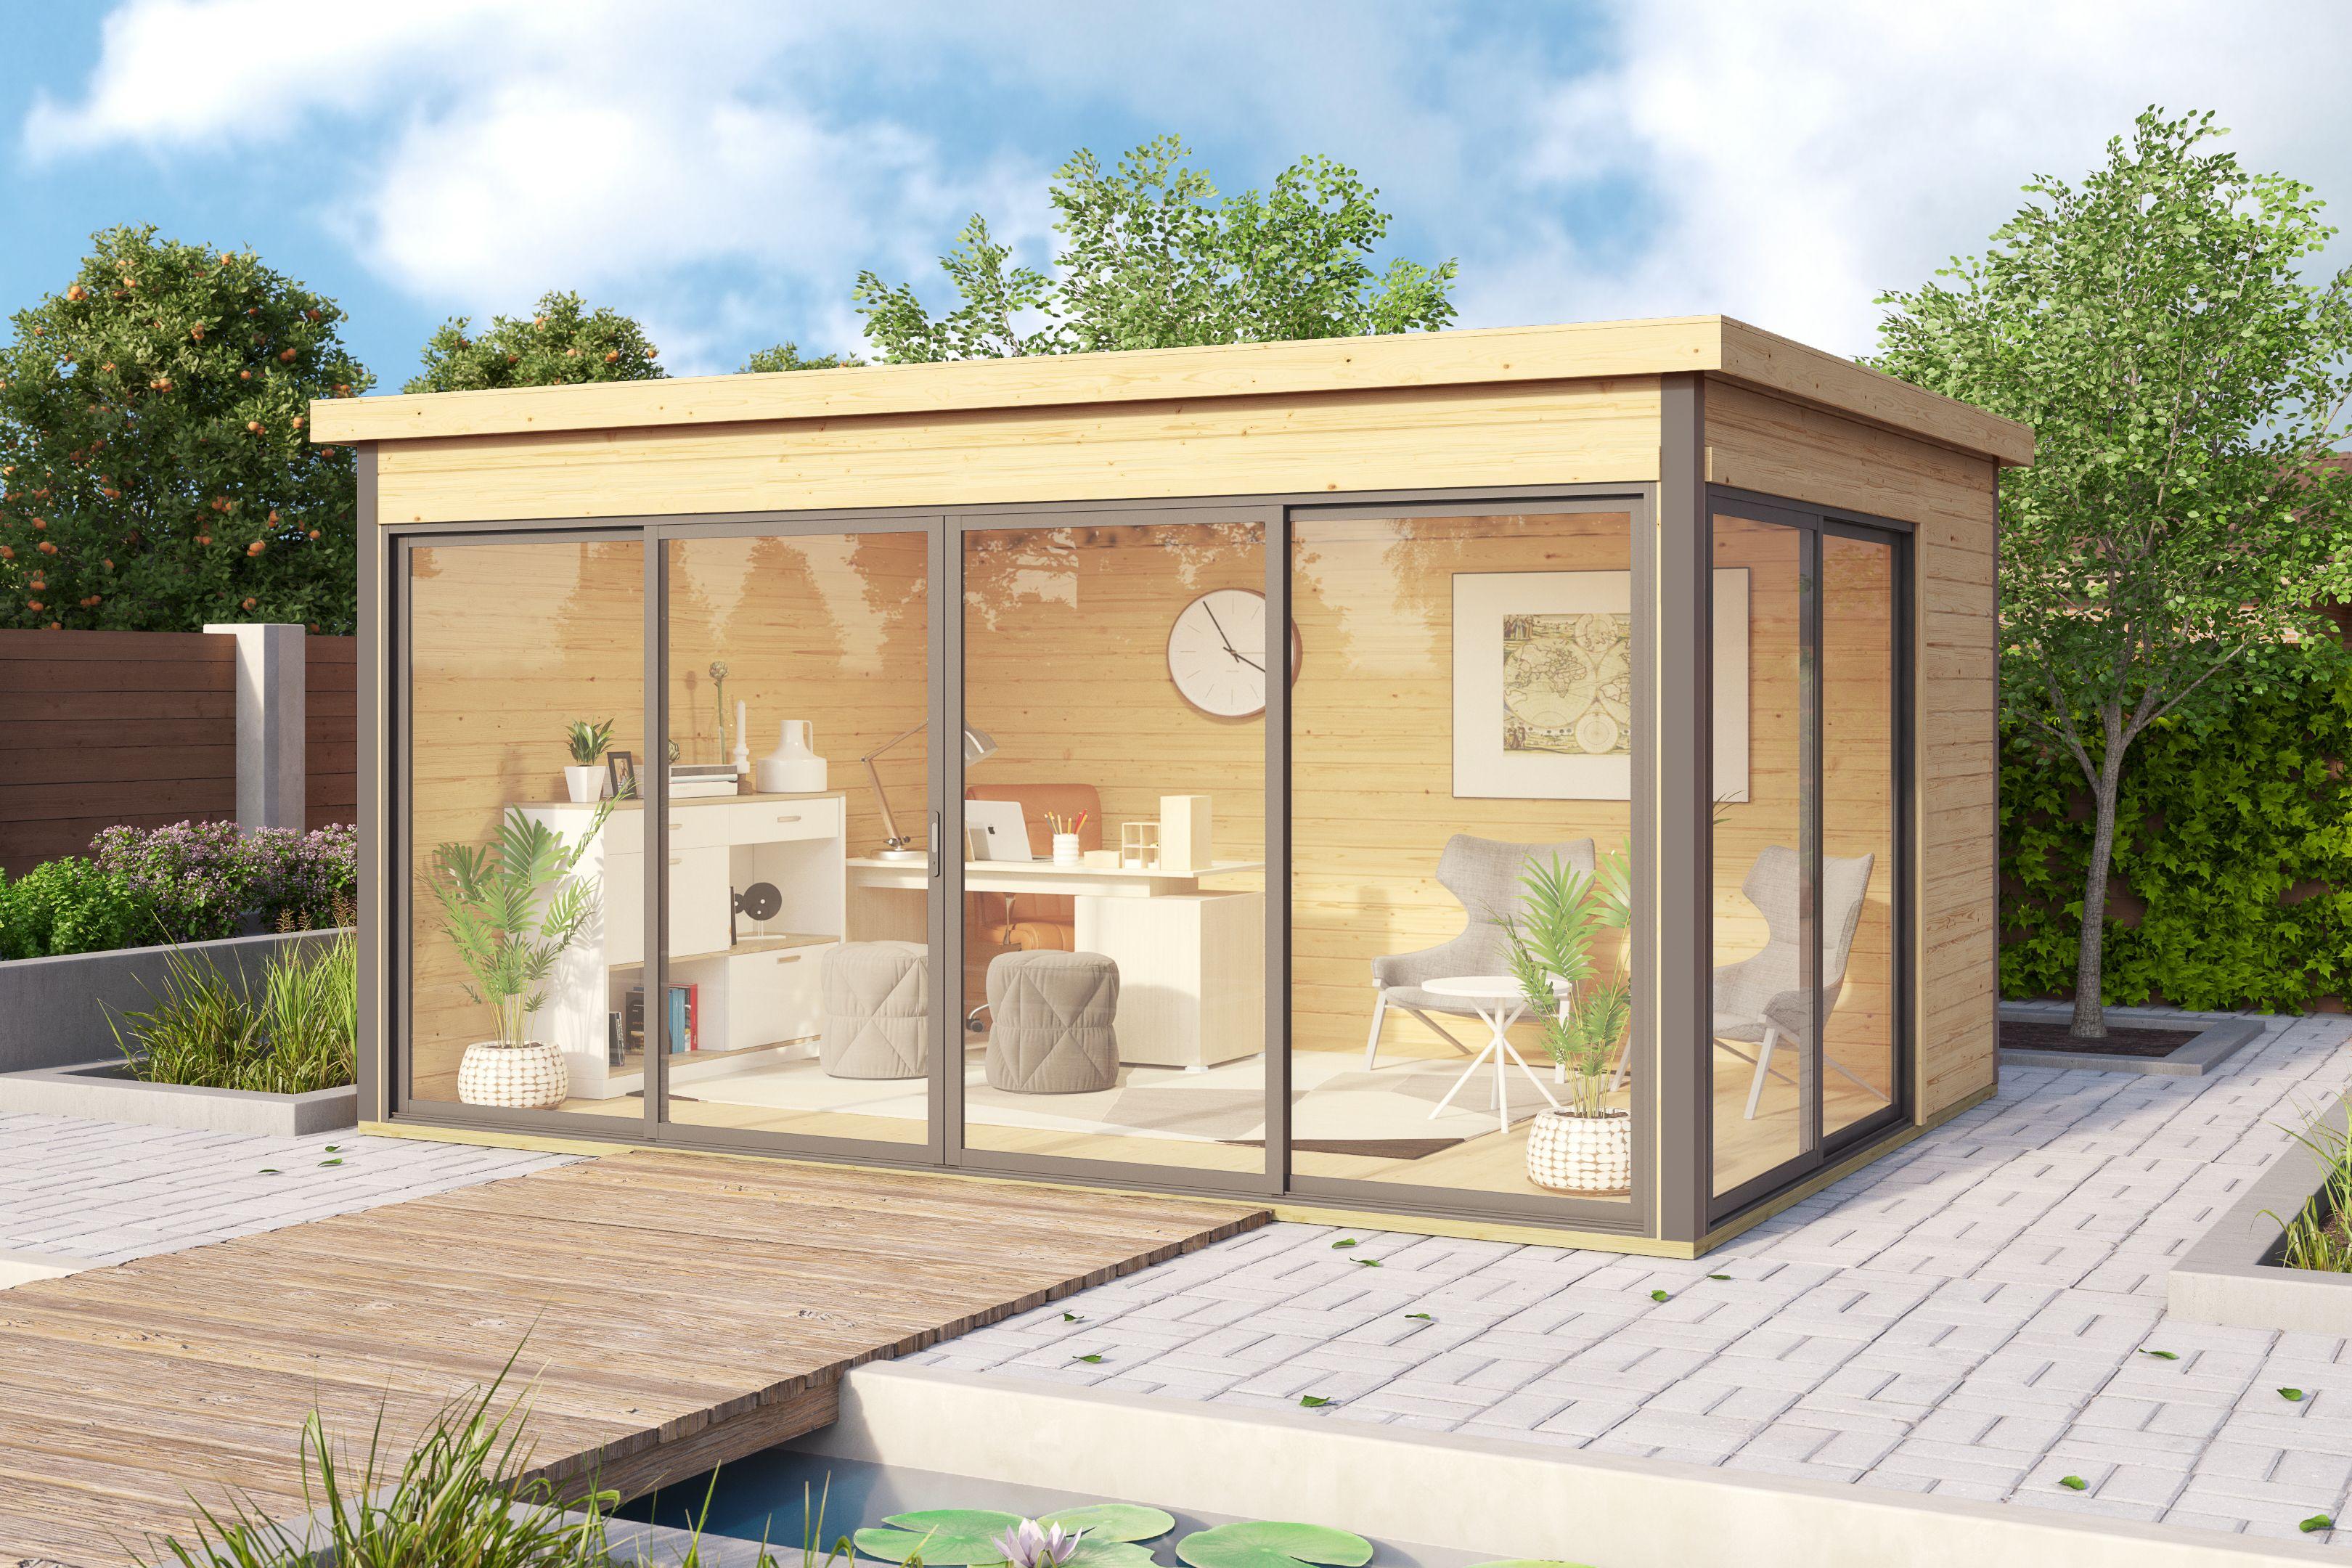 Bureau De Jardin Argos 4 12m2 Bureau De Jardin Chalet De Jardin Maisonnette En Bois